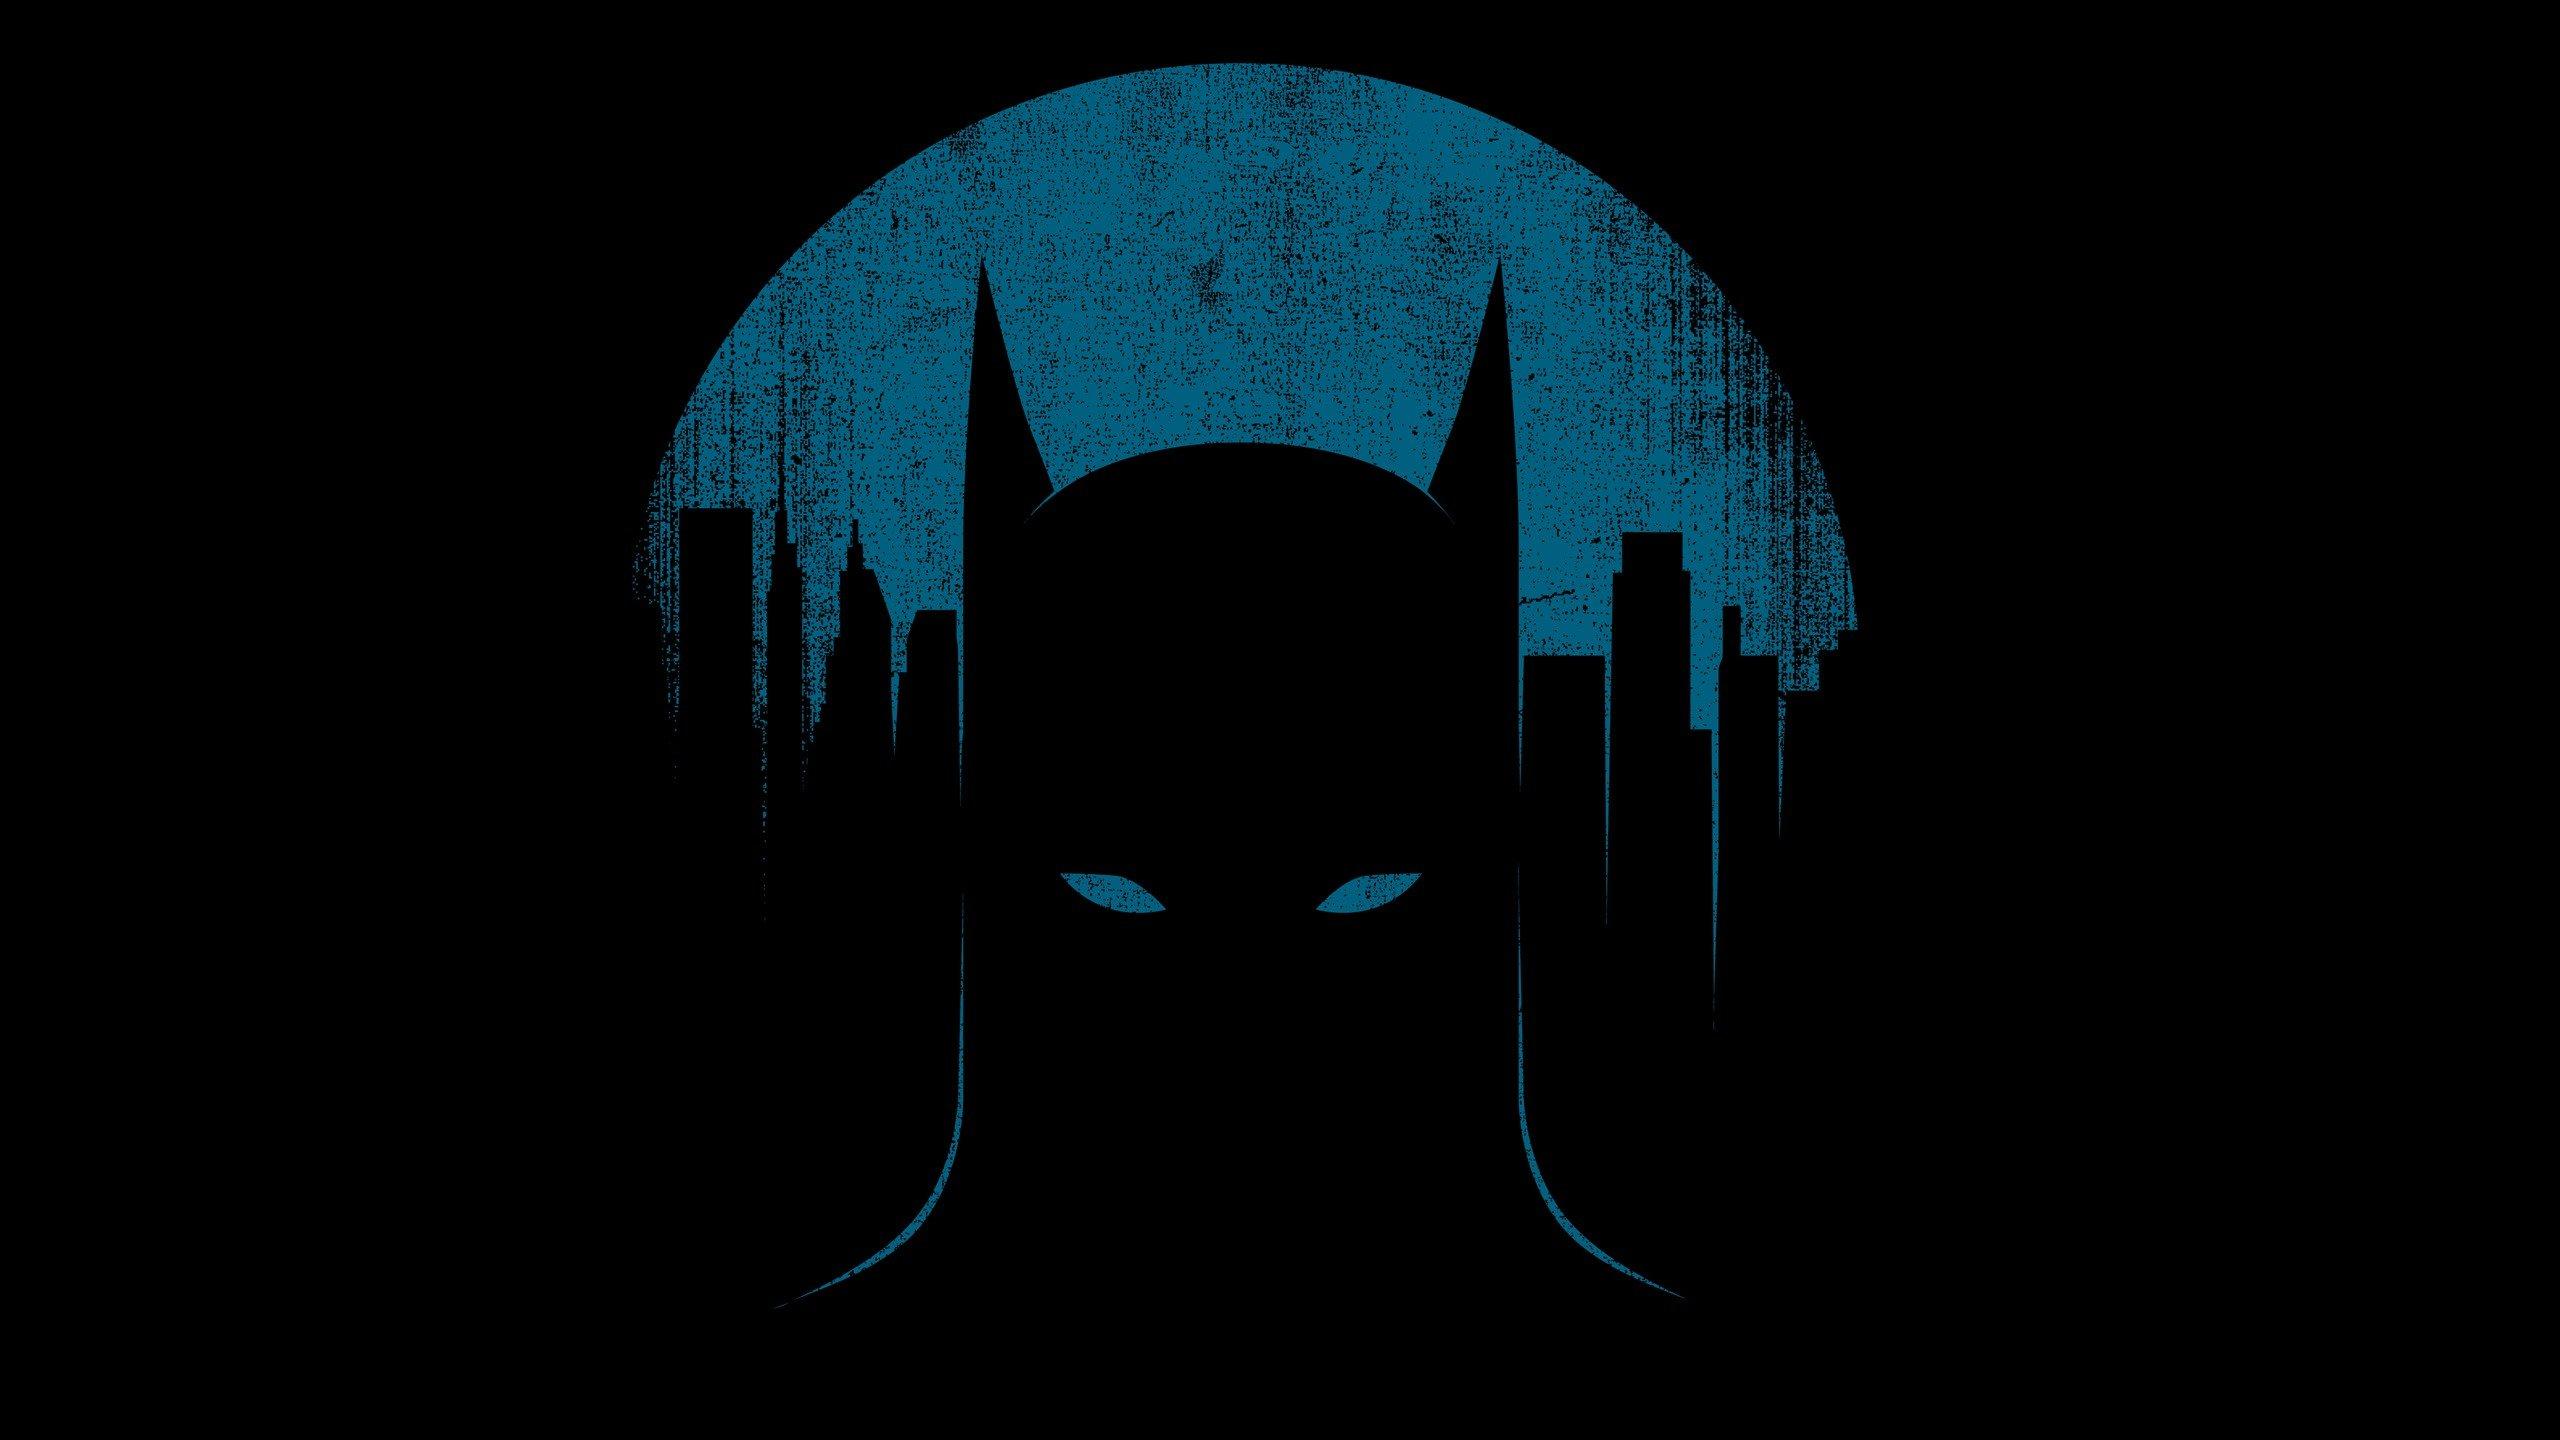 Batman Wallpapers 2560x1440 Desktop Backgrounds